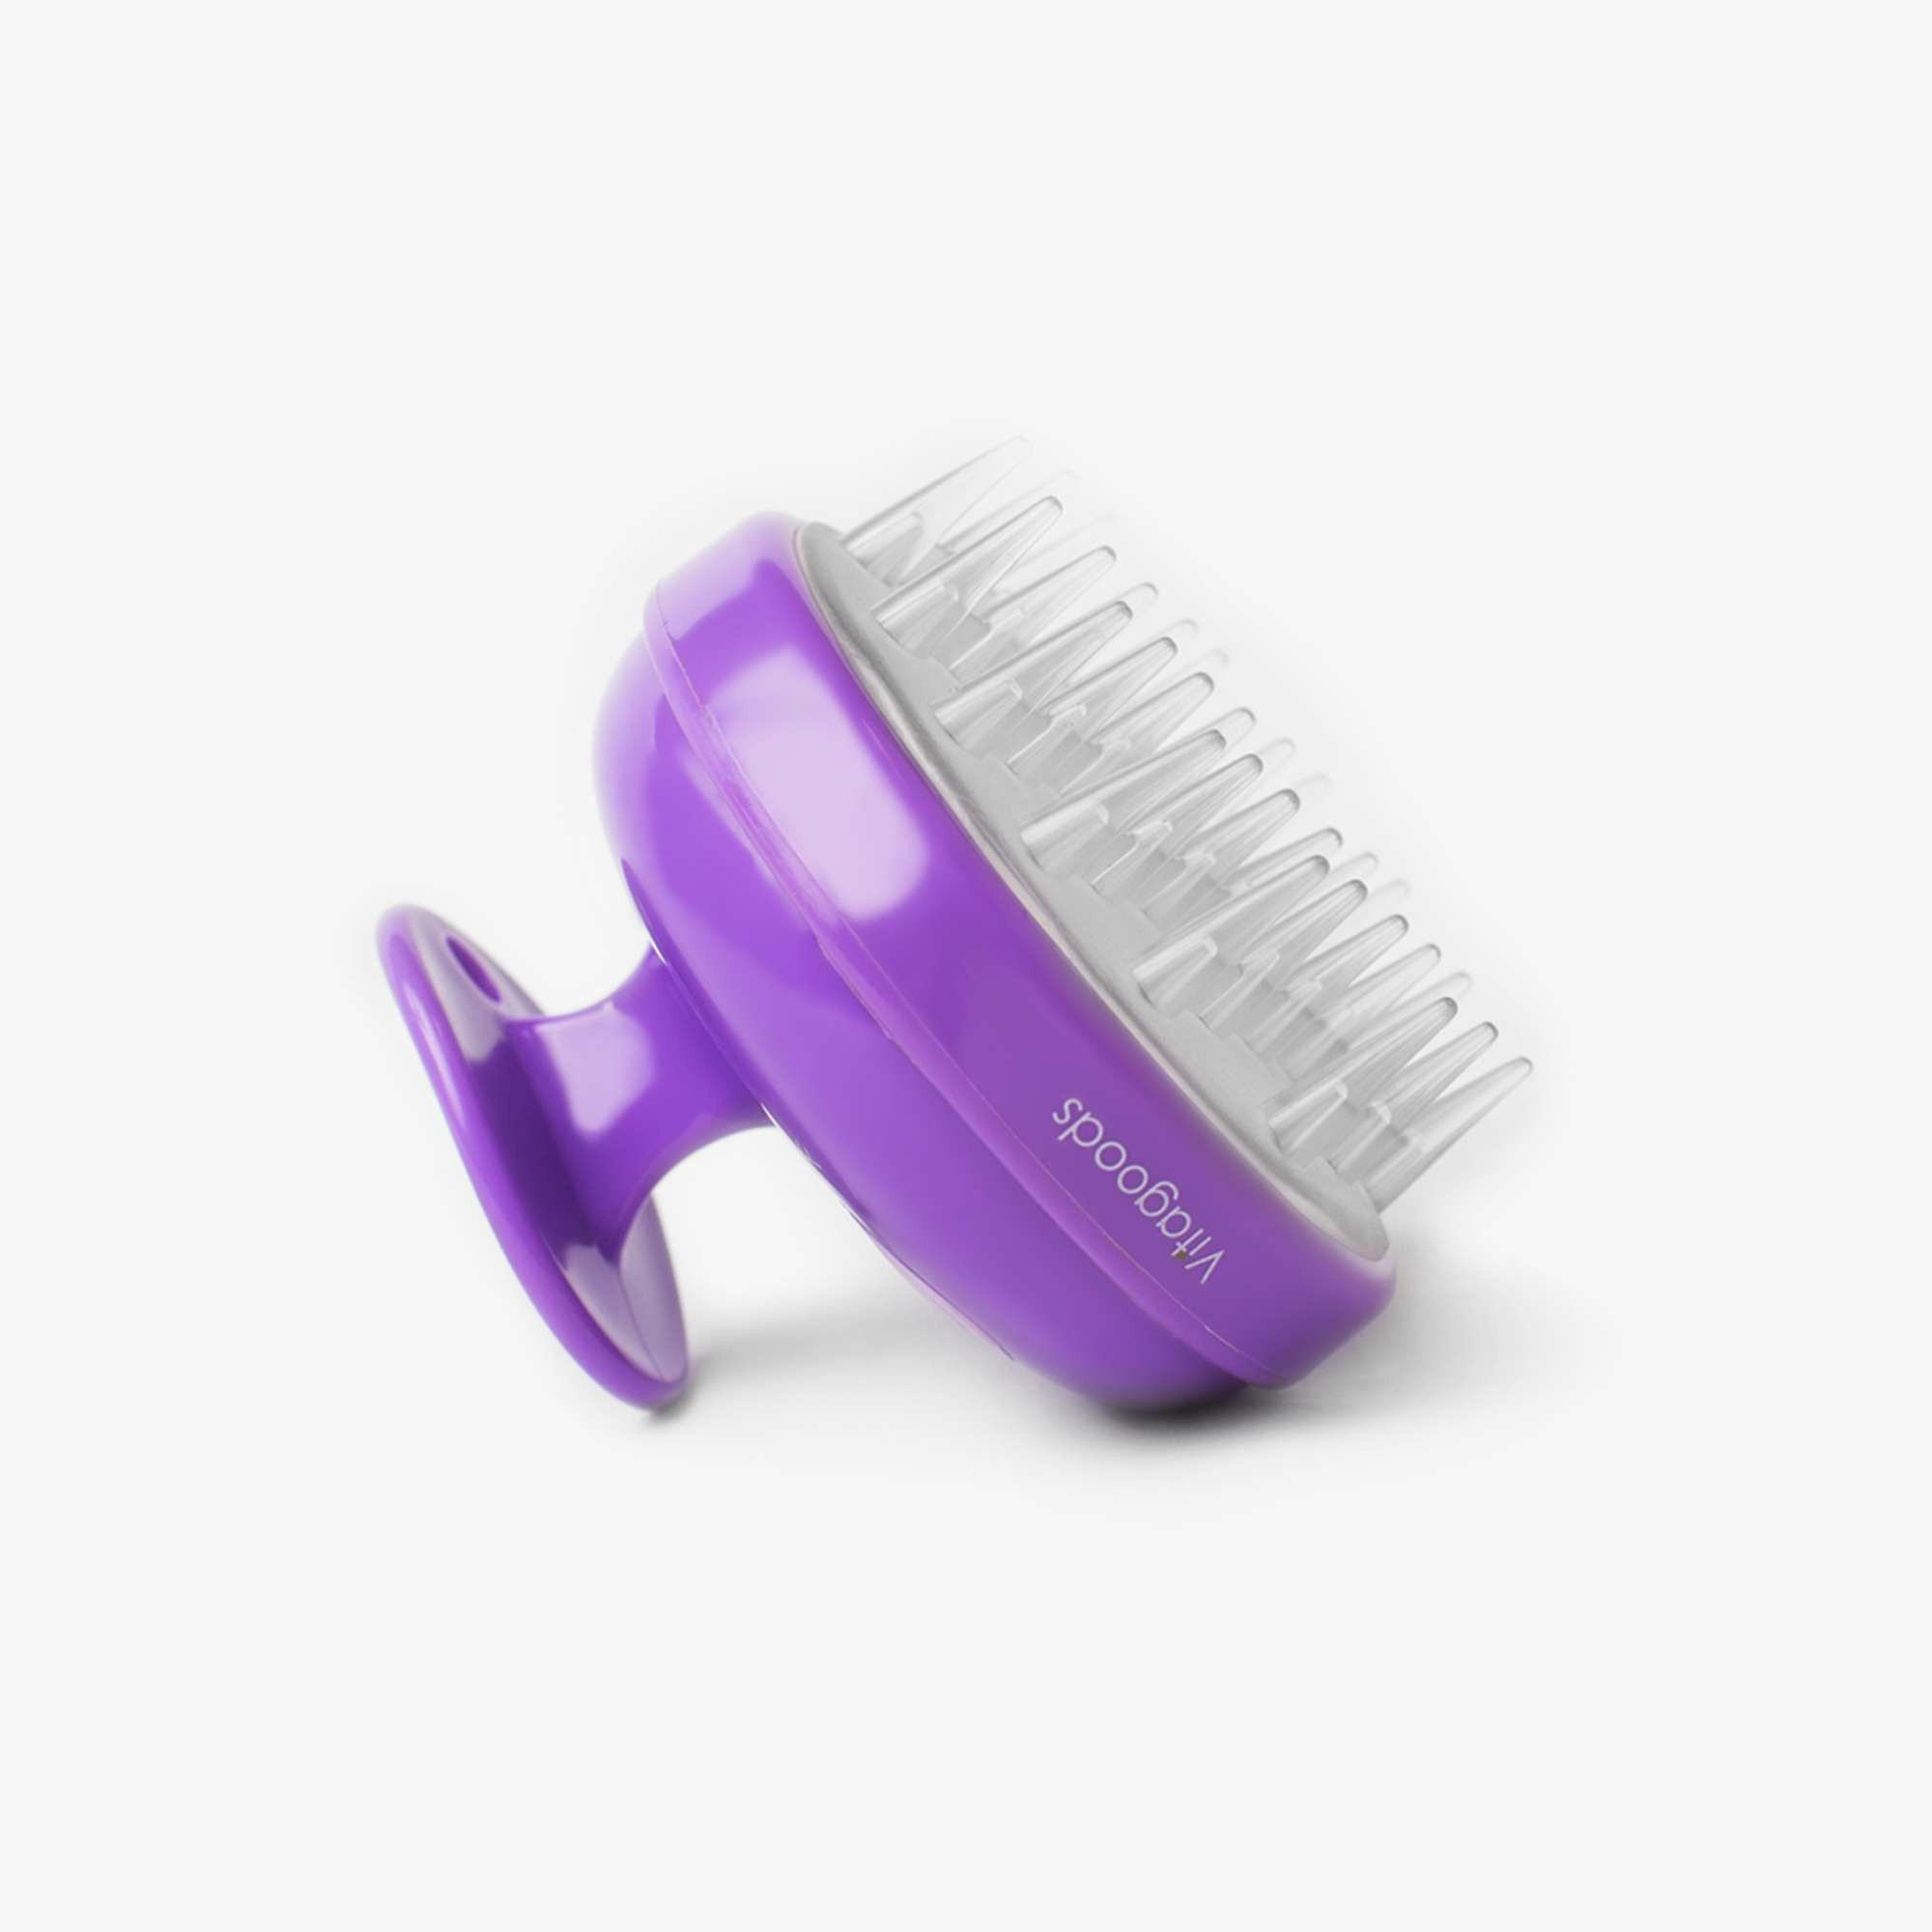 Scalp massaging shampoo brush u vitagoods ideas and care tips for